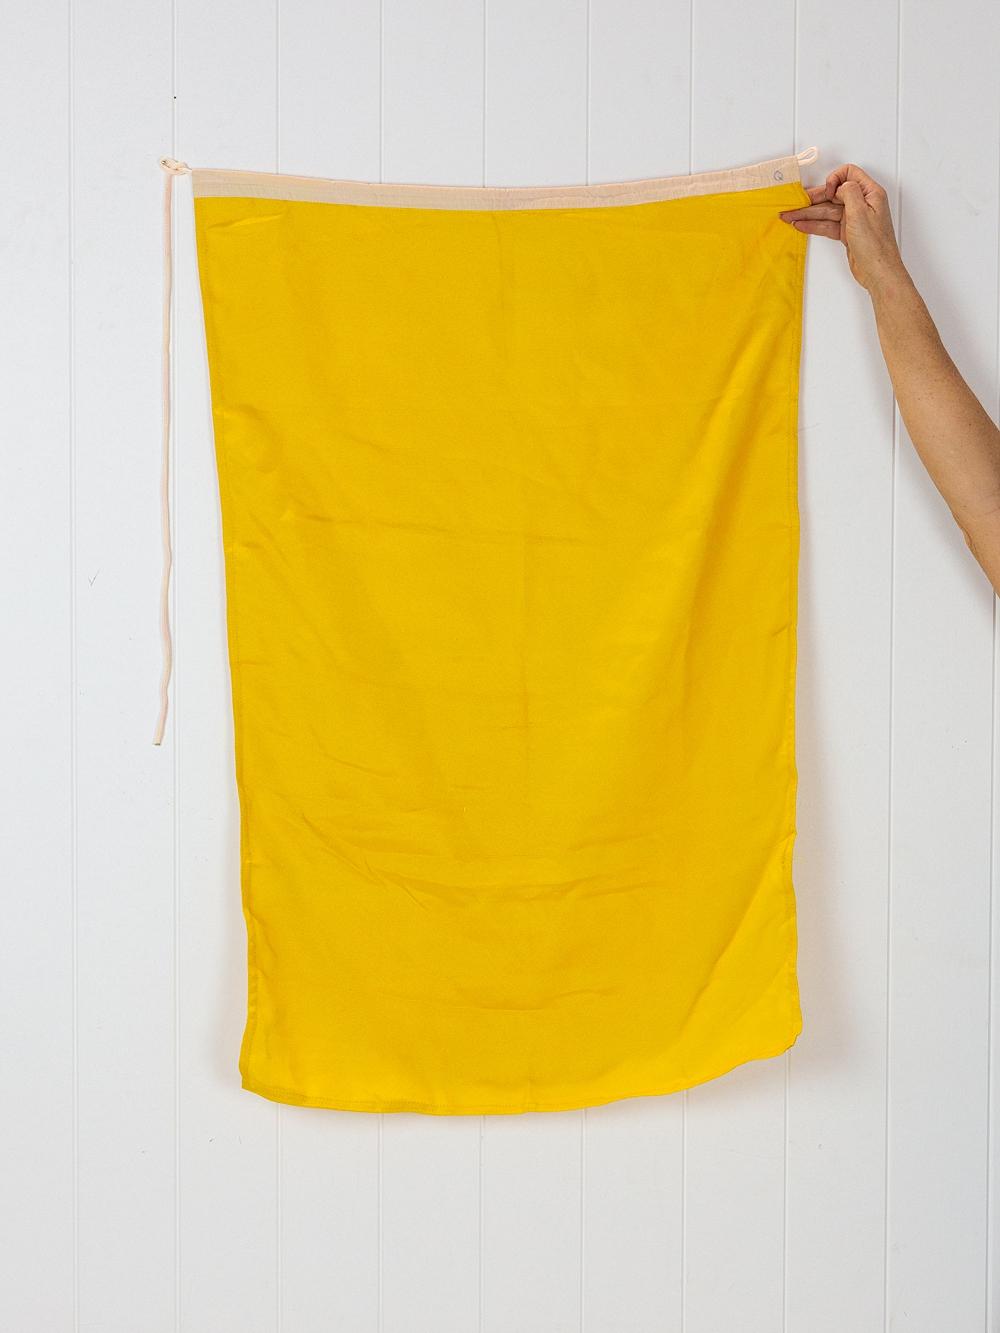 Flag Q #7241